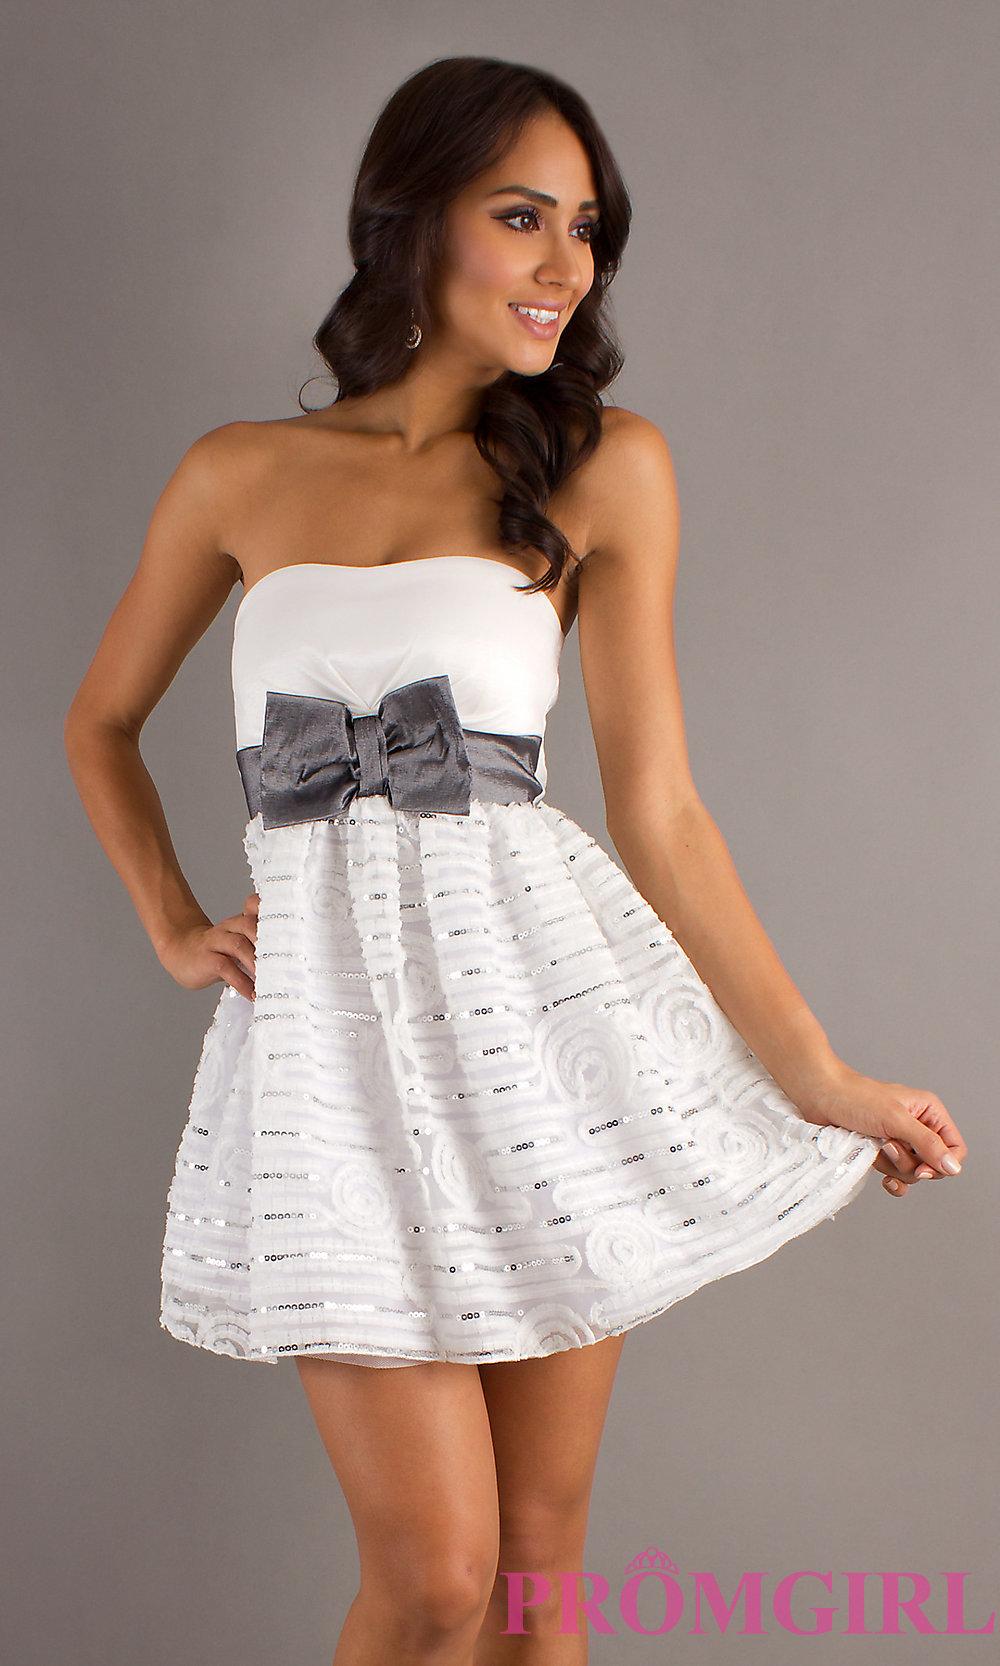 Cute Short Dresses For Girls & 20 Great Ideas - Dresses Ask